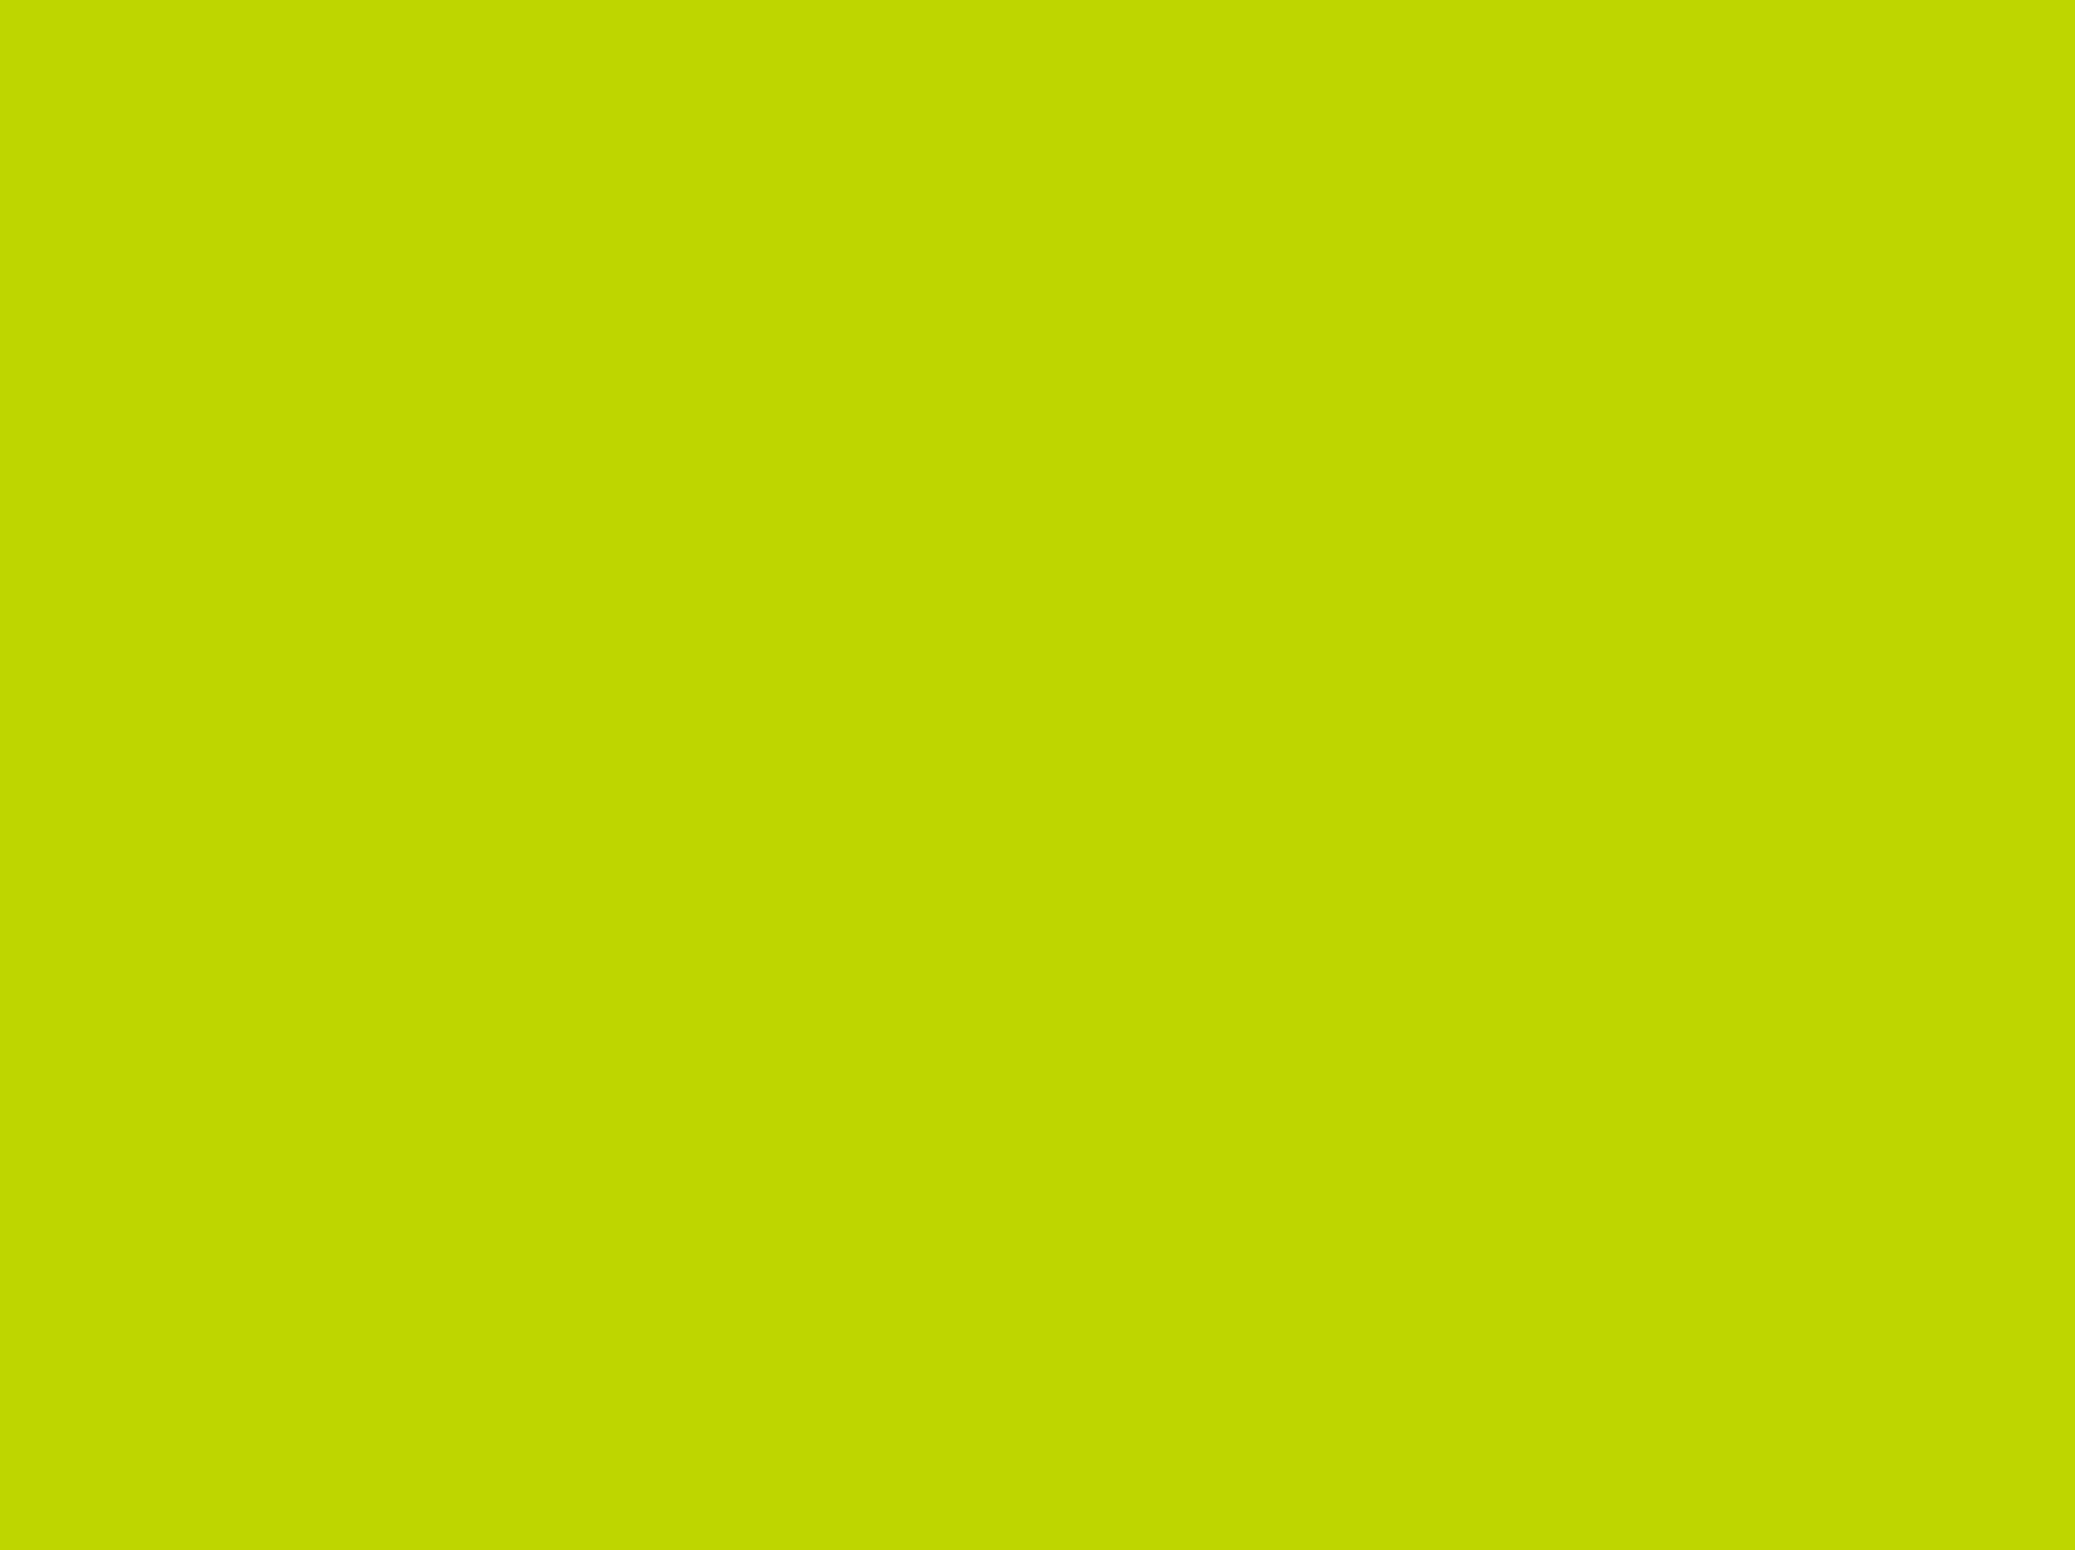 Relish green background